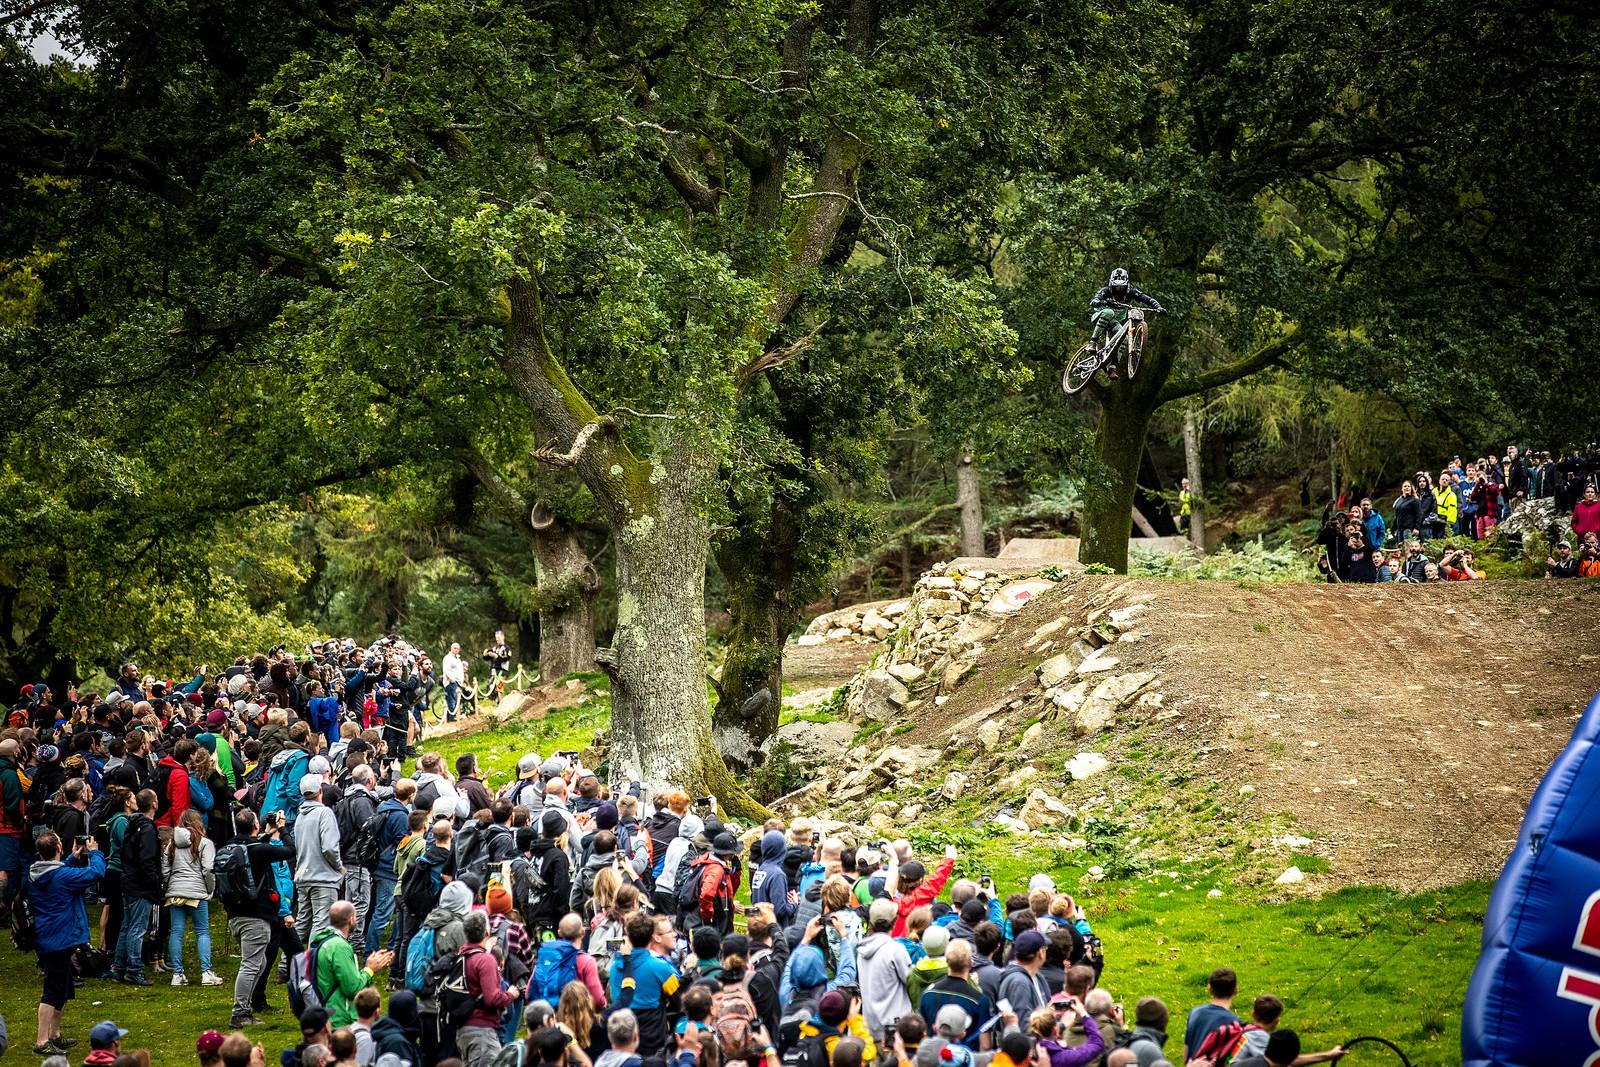 Red Bull Hardline in Photos - Red Bull Hardline in Photos - Mountain Biking Pictures - Vital MTB